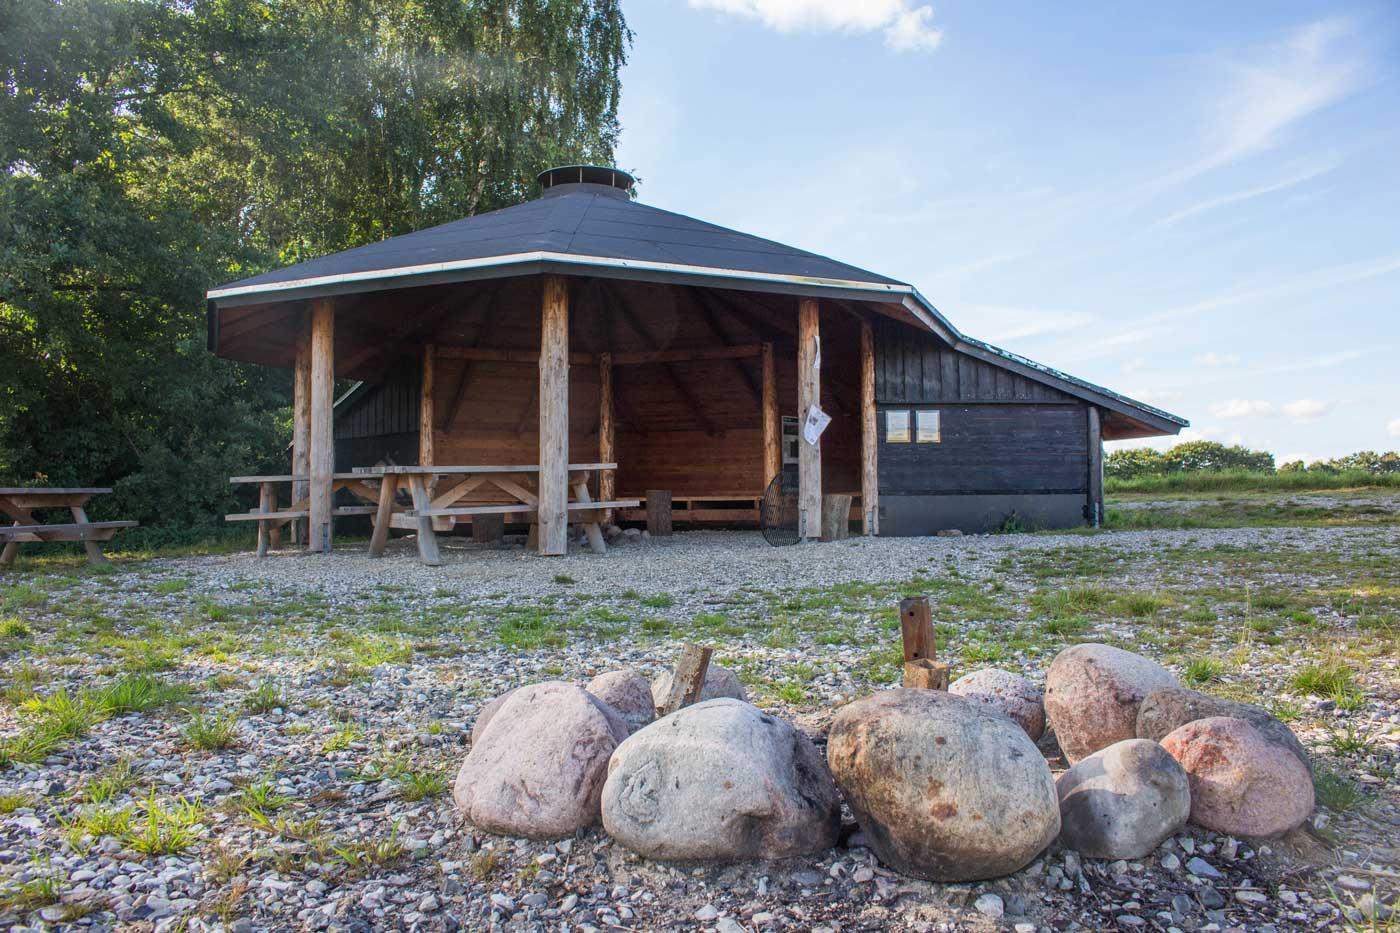 Shelterpladsen ved Årslev